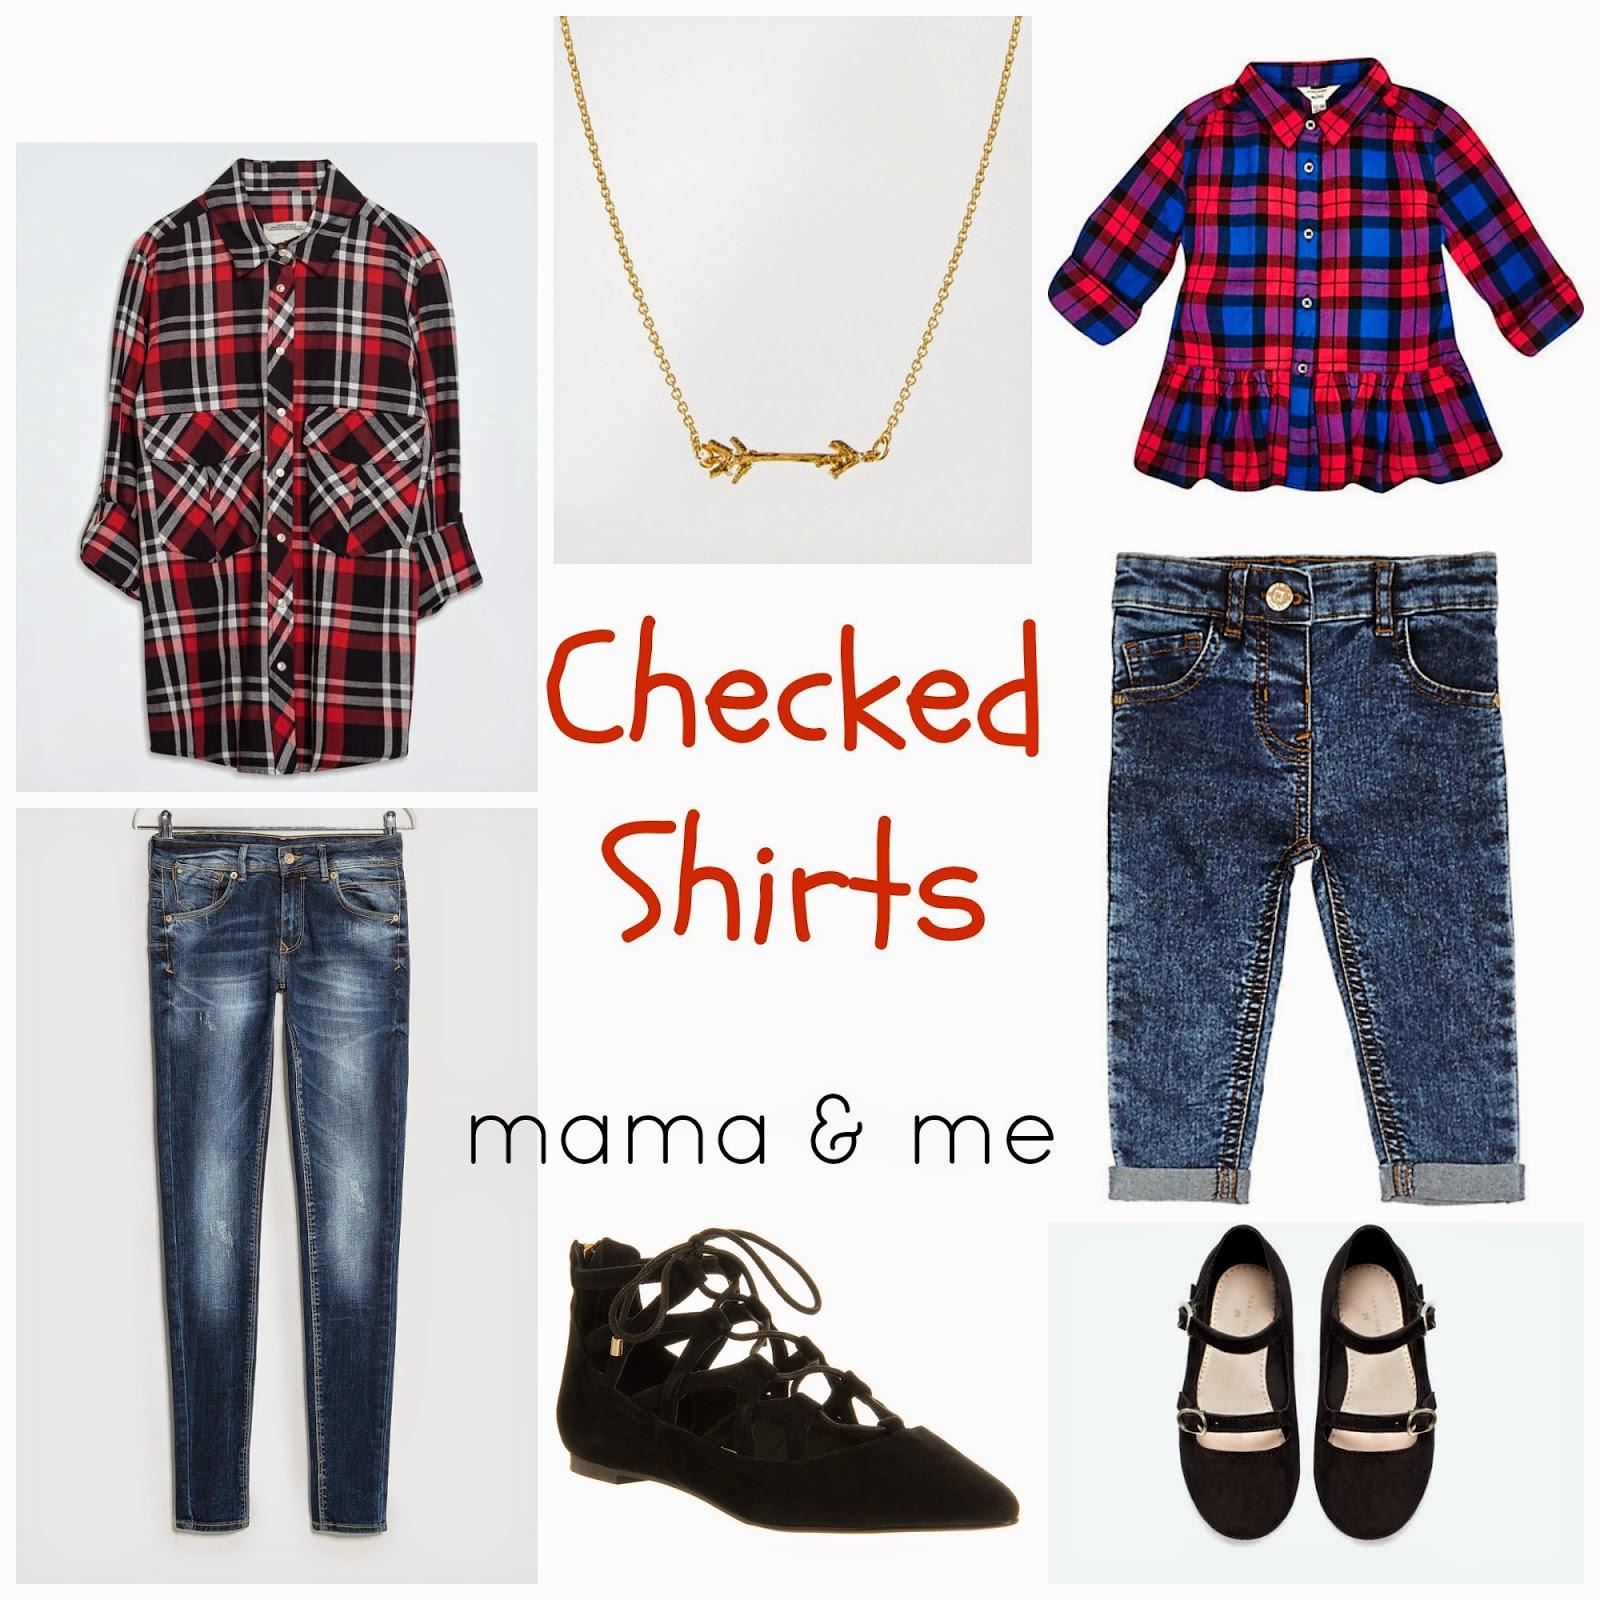 The 3 must-have tops for easy - and stylish Mama & Me days | mama and me style | mama fashion | urls fashion | river island mini | mango | zara | jewelled sweaters | checked shirt | zara | easy chic | school run style | leather leggings | zara mini | marks & Spencer | gap | cable cardigan | style | mamasVIB | fashion editor picks | stylish mums | mum and mini style | office | house of fraser | amma and girl style | mamas vin | blog | fashion | news | fashion trends | mamasVIB